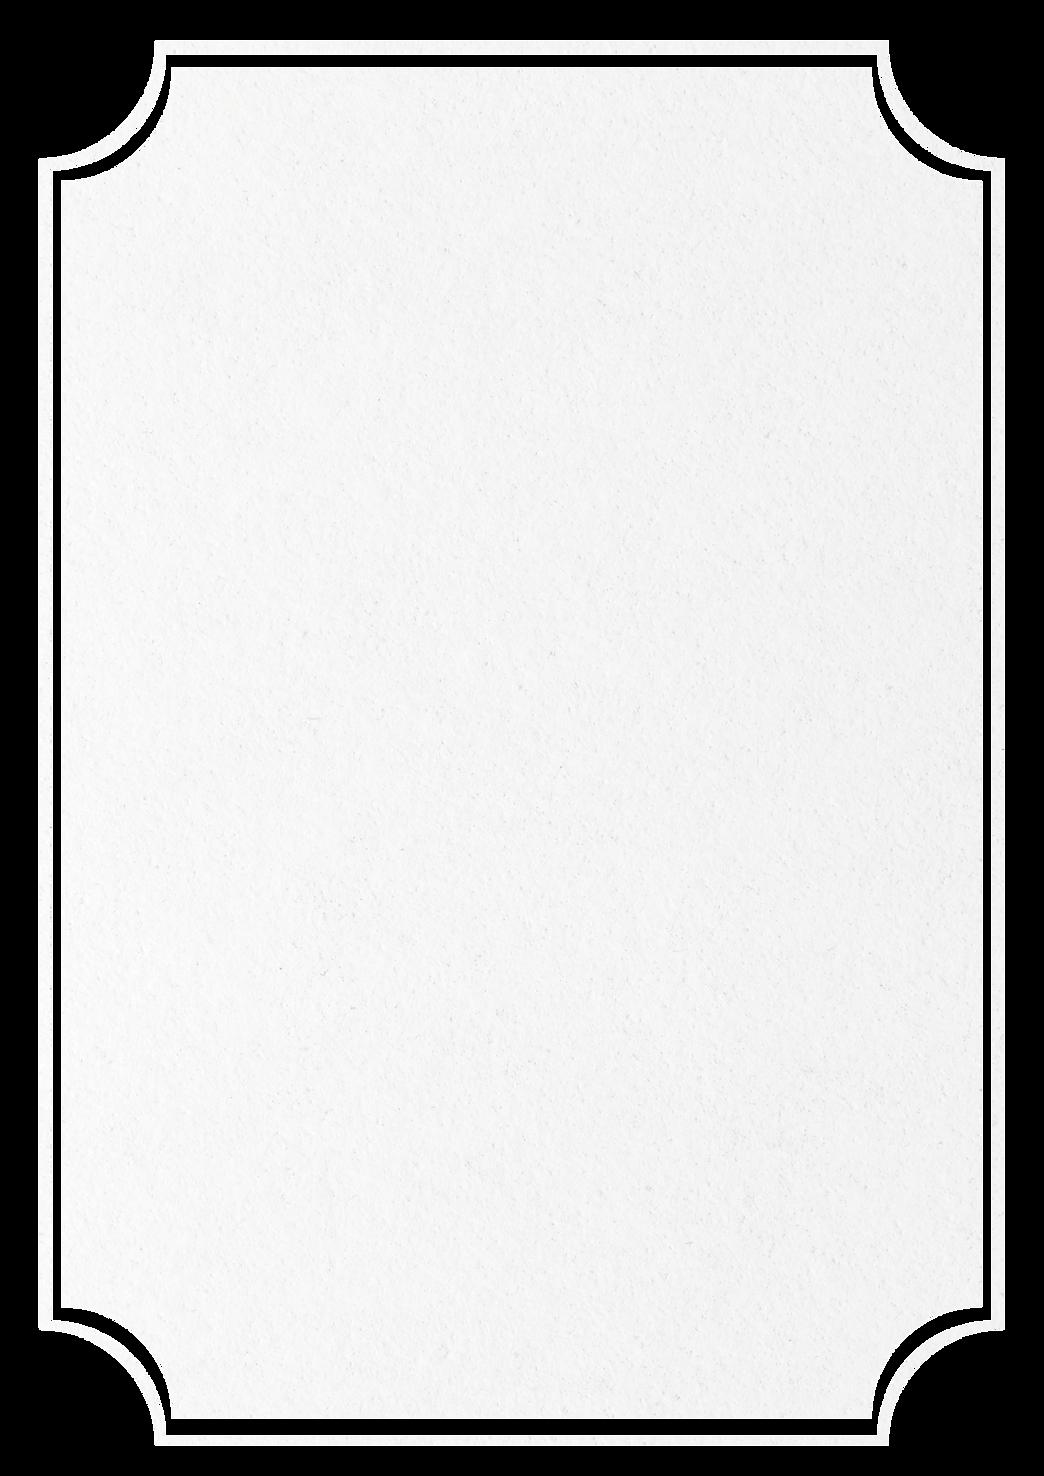 BG -03.png